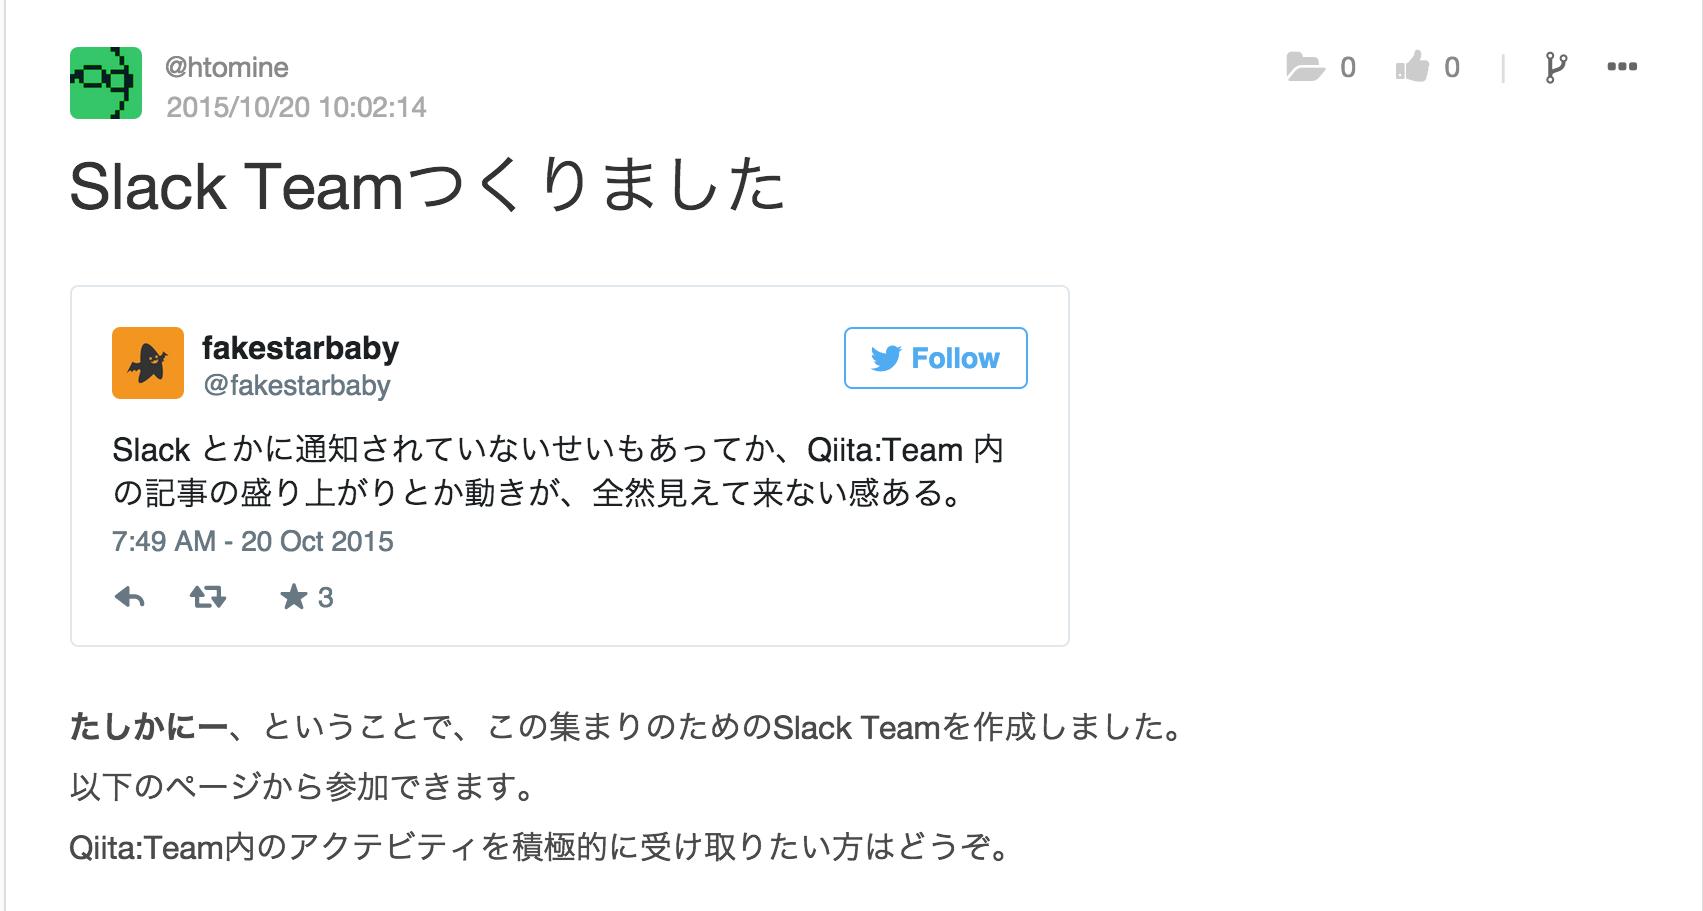 Slack_Teamつくりました_-_情報共有ツールお悩み相談.png